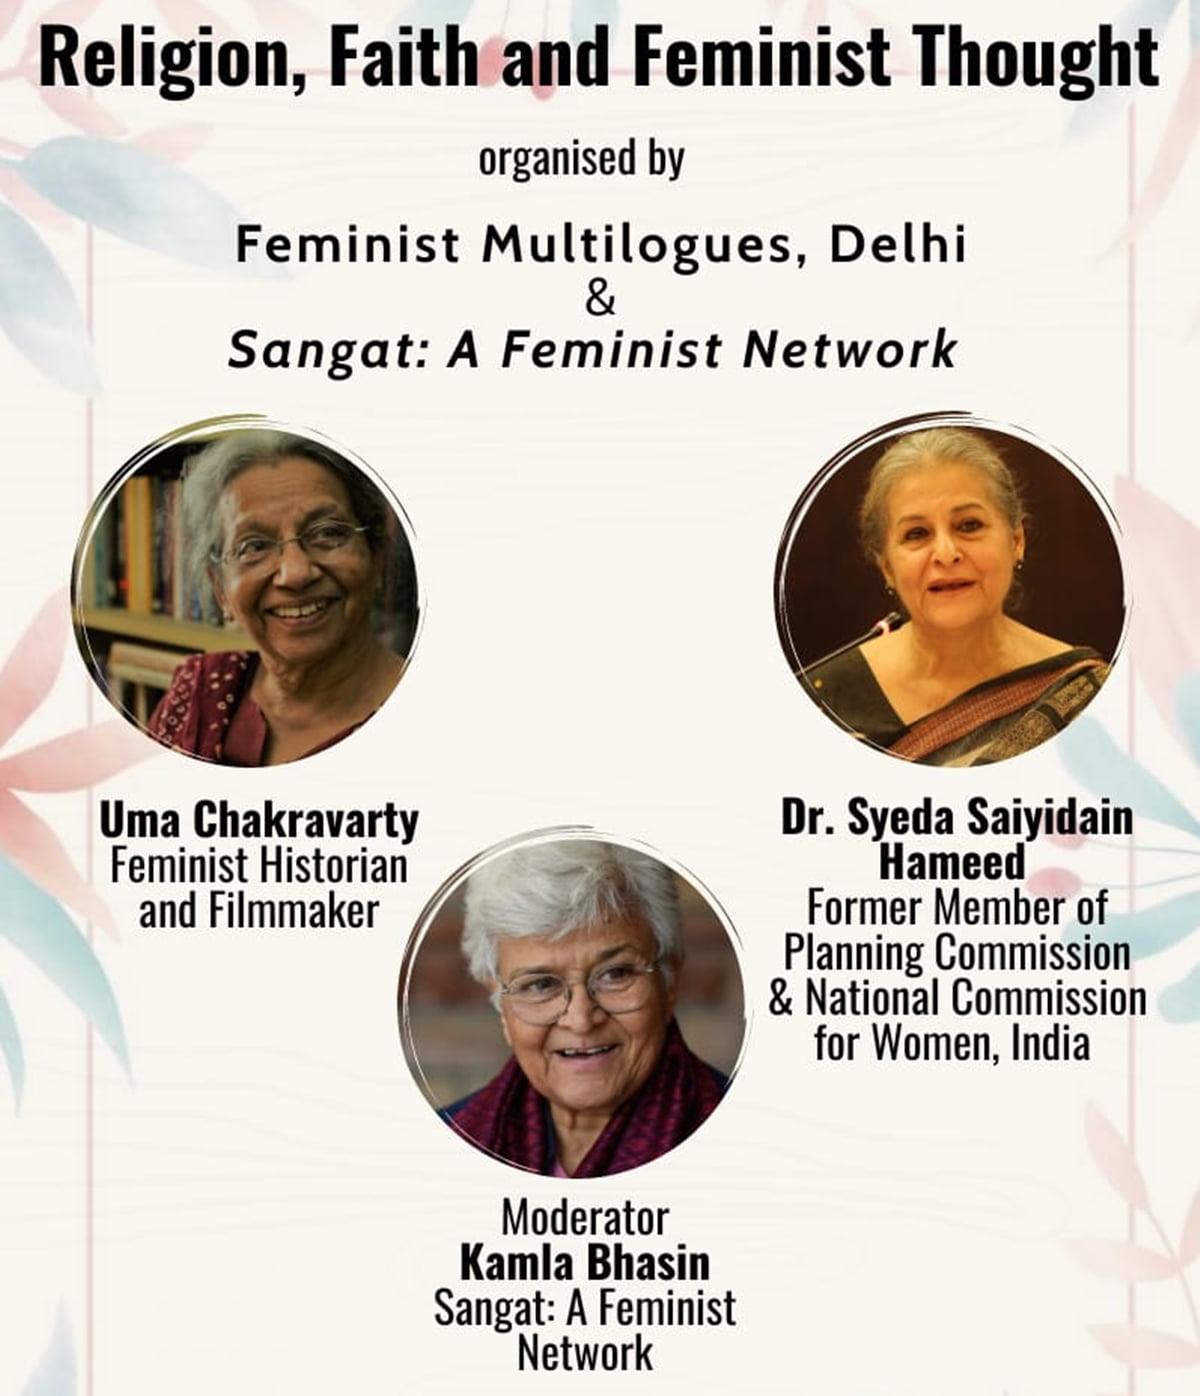 Sangat's Session On Faith & Feminism By Uma Chakravarti, Kamla Bhasin & Syeda Hameed